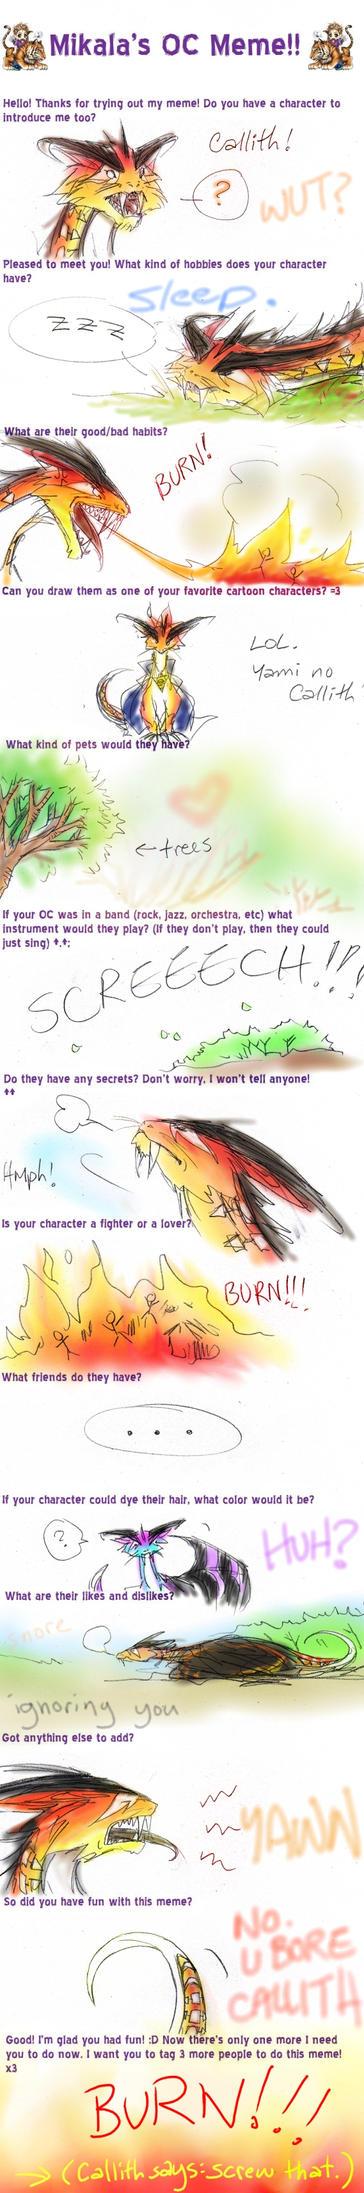 Mikala's OC Meme: Callith by Achiru-et-al